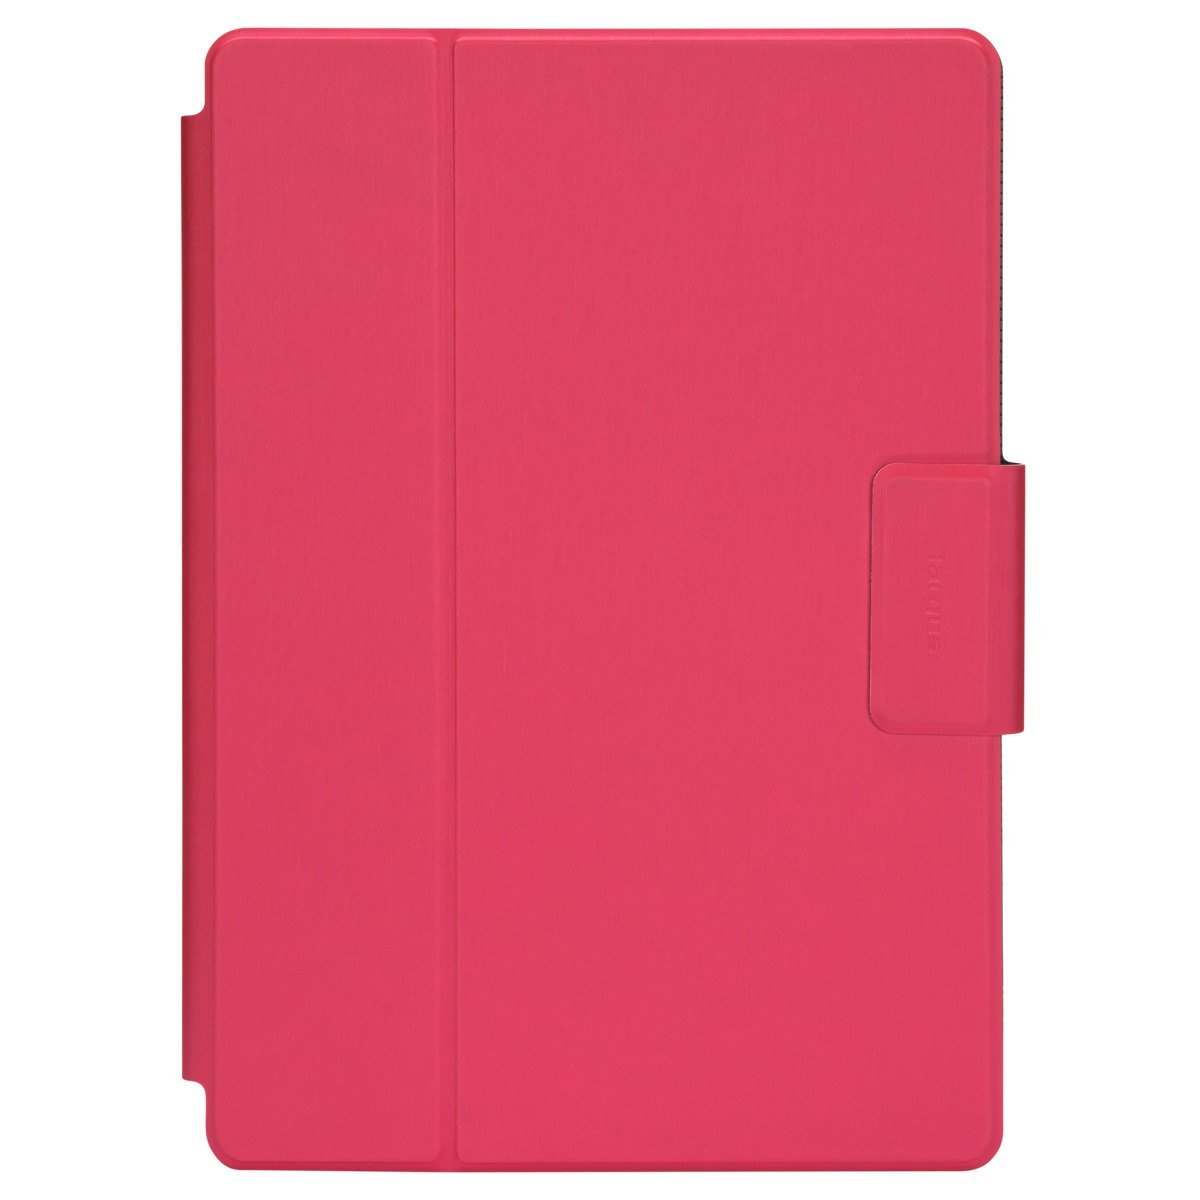 "Targus Safe Fit 26.7 cm (10.5"") Cover Pink"